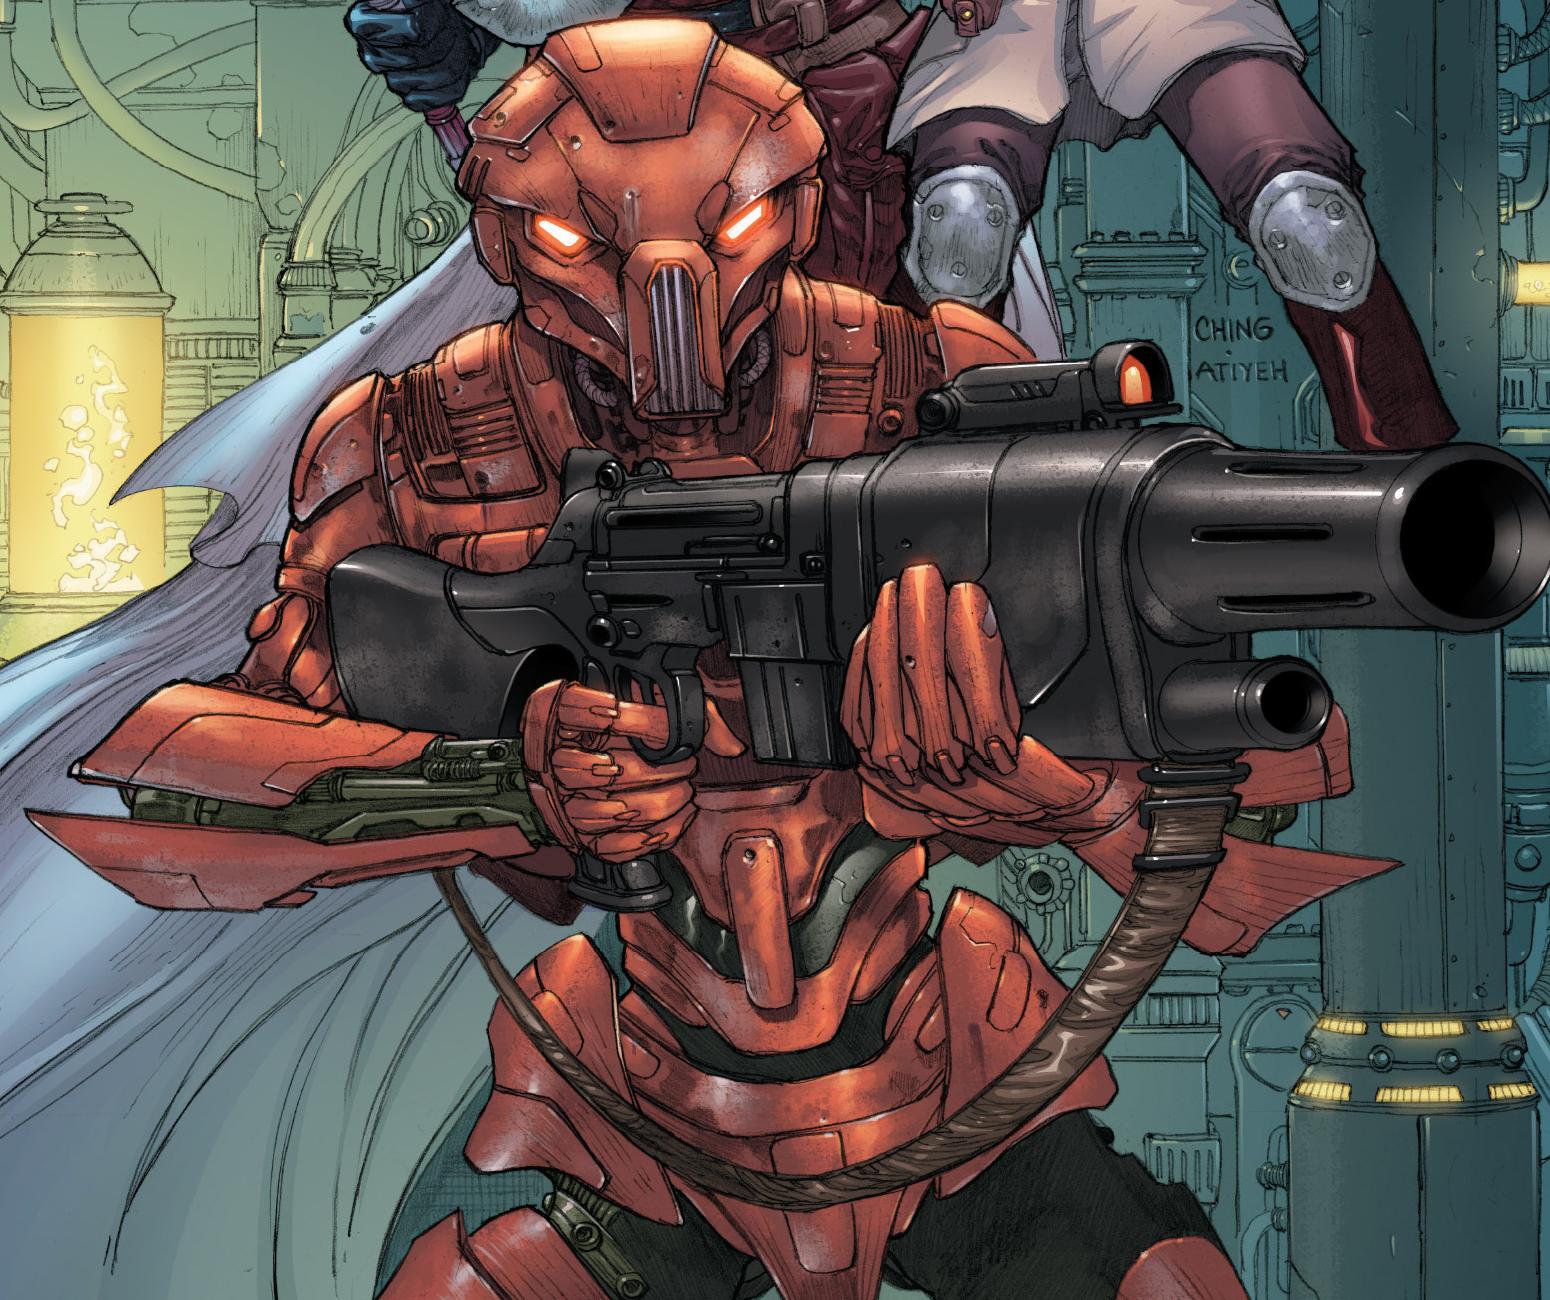 HK-24 series assassin droid